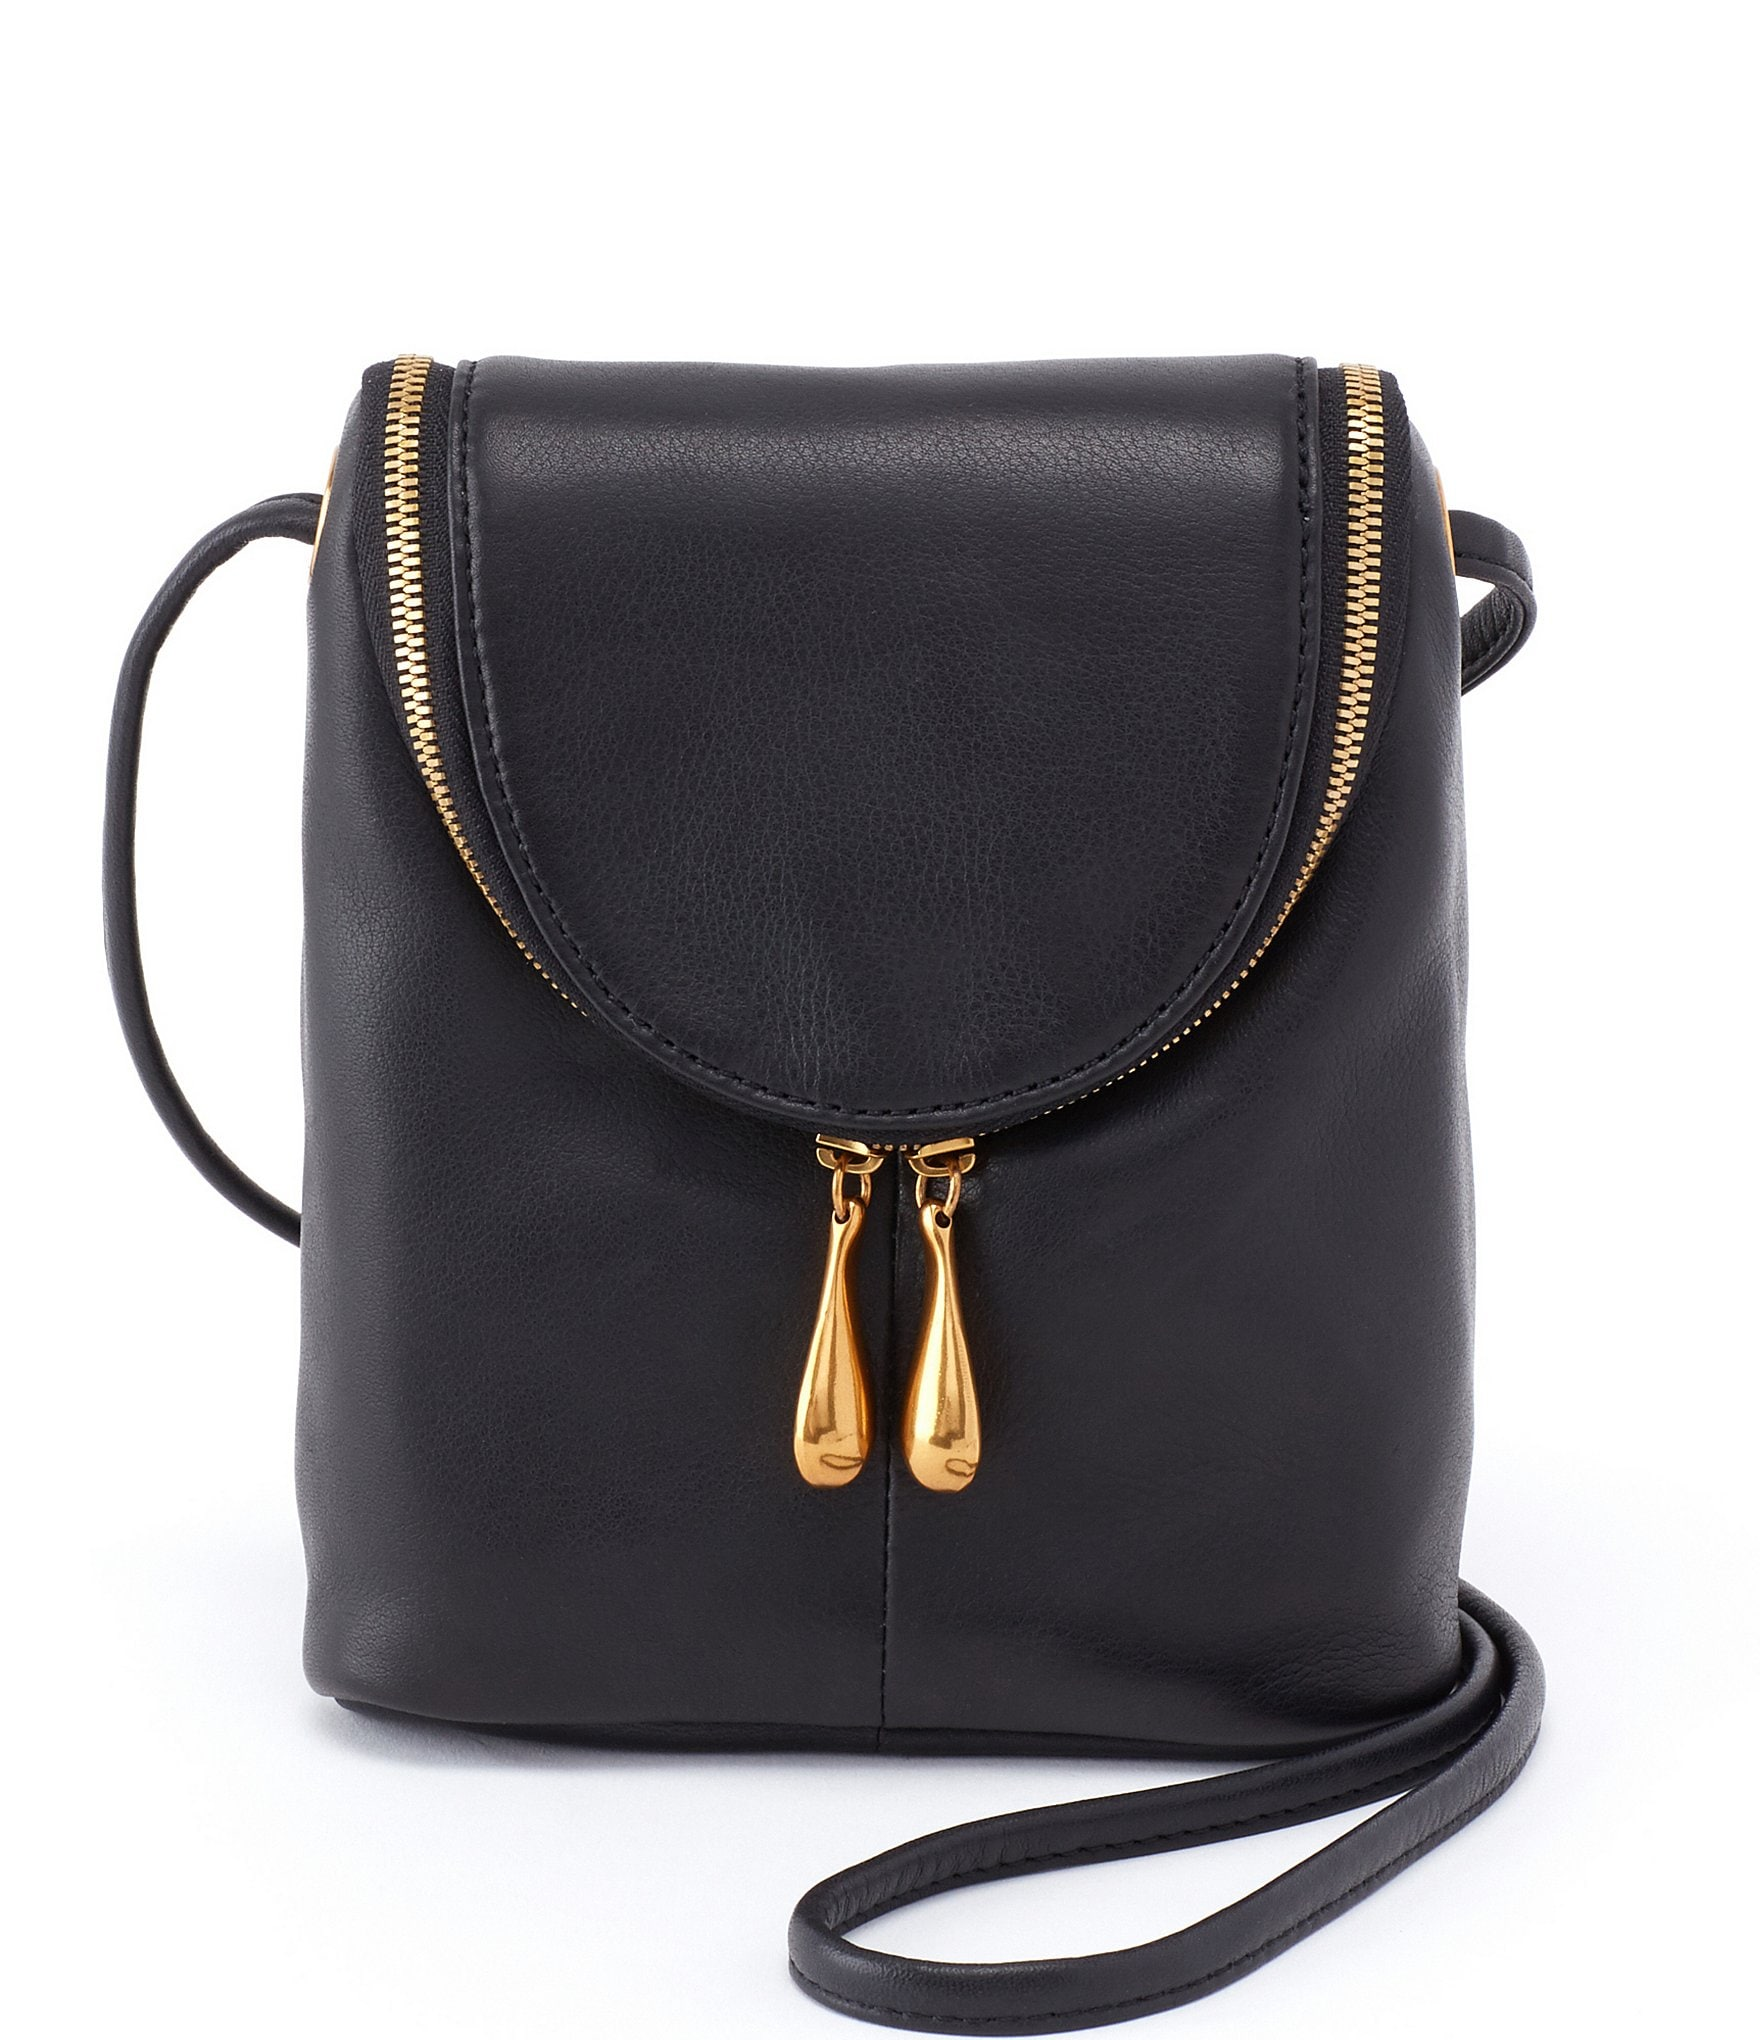 16fc0b9c44 Handbags